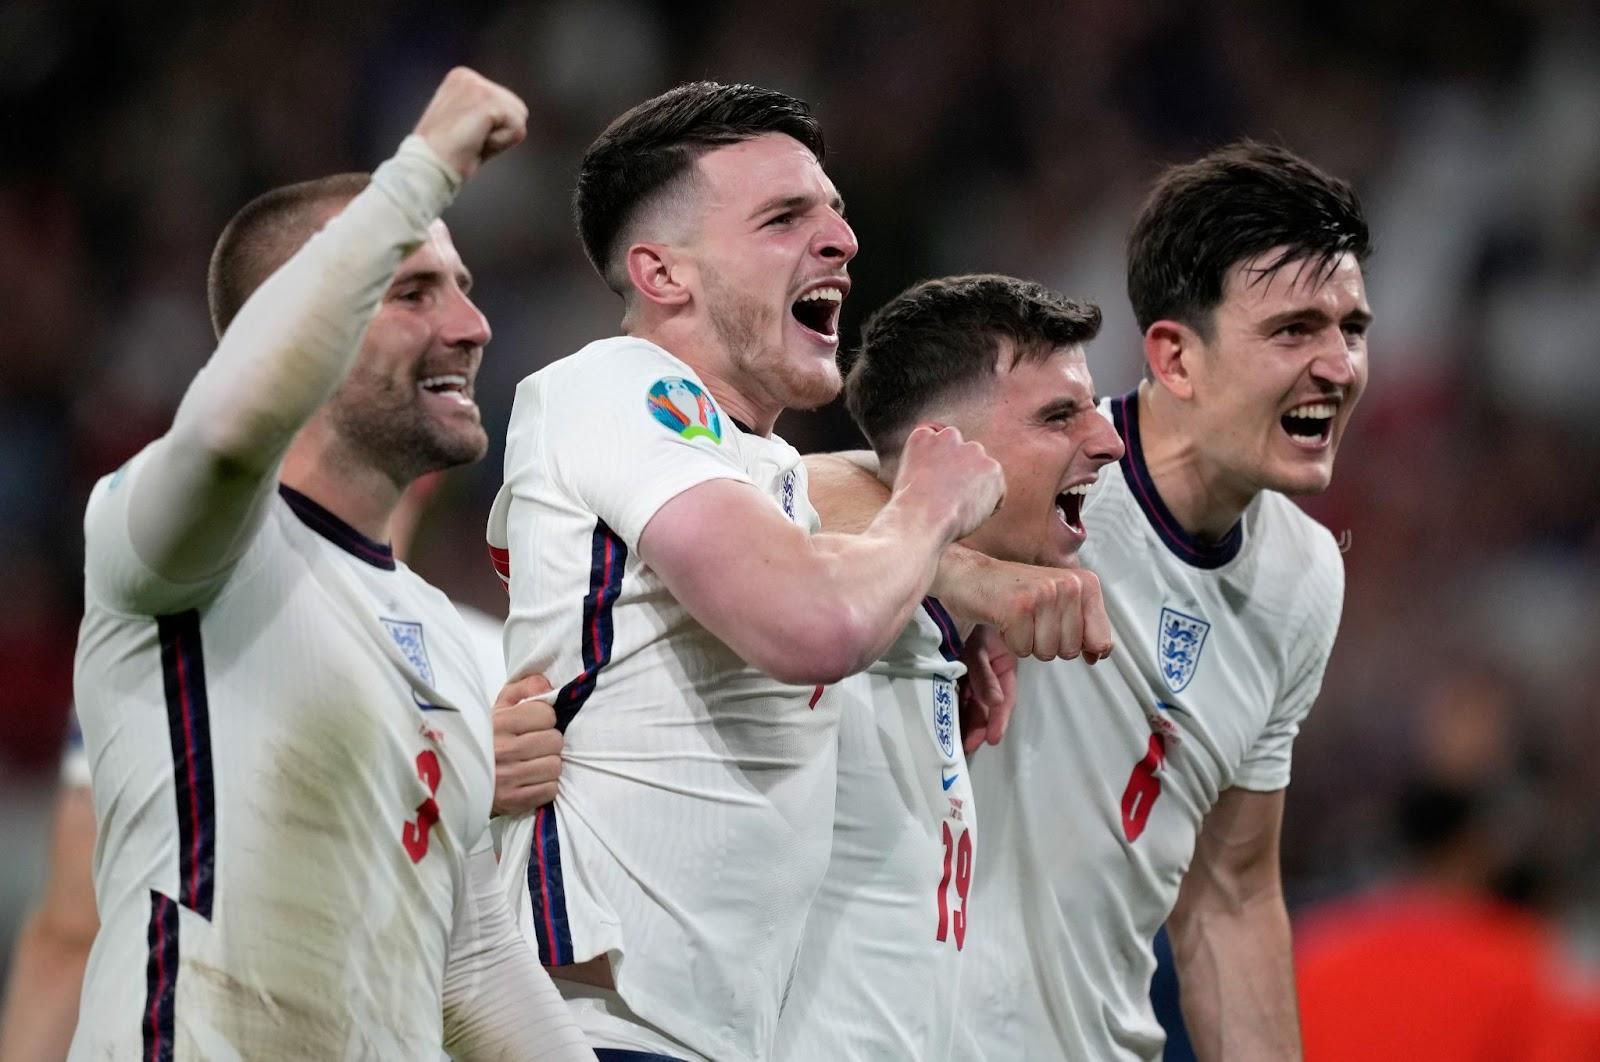 England players celebrate the semi-final win